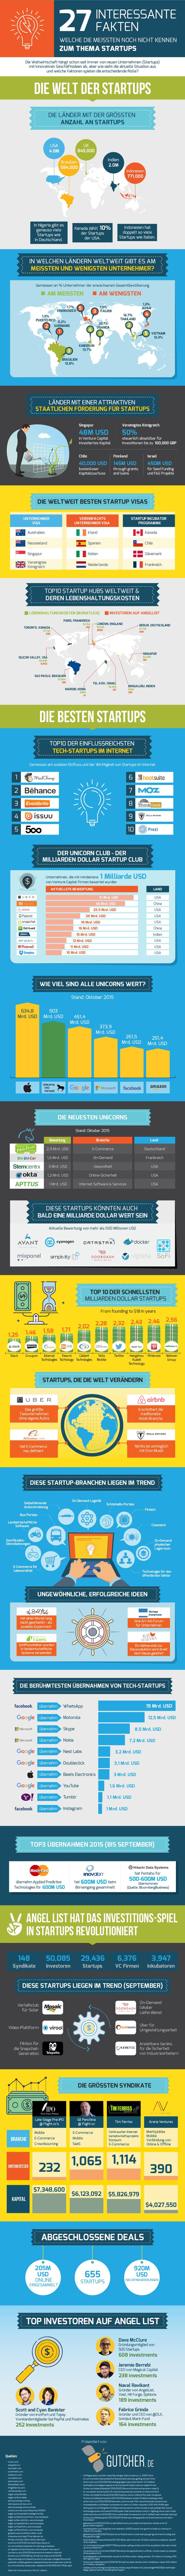 Infografik mit 27 Fakten zu Start-ups. Bild: Gutcher.de